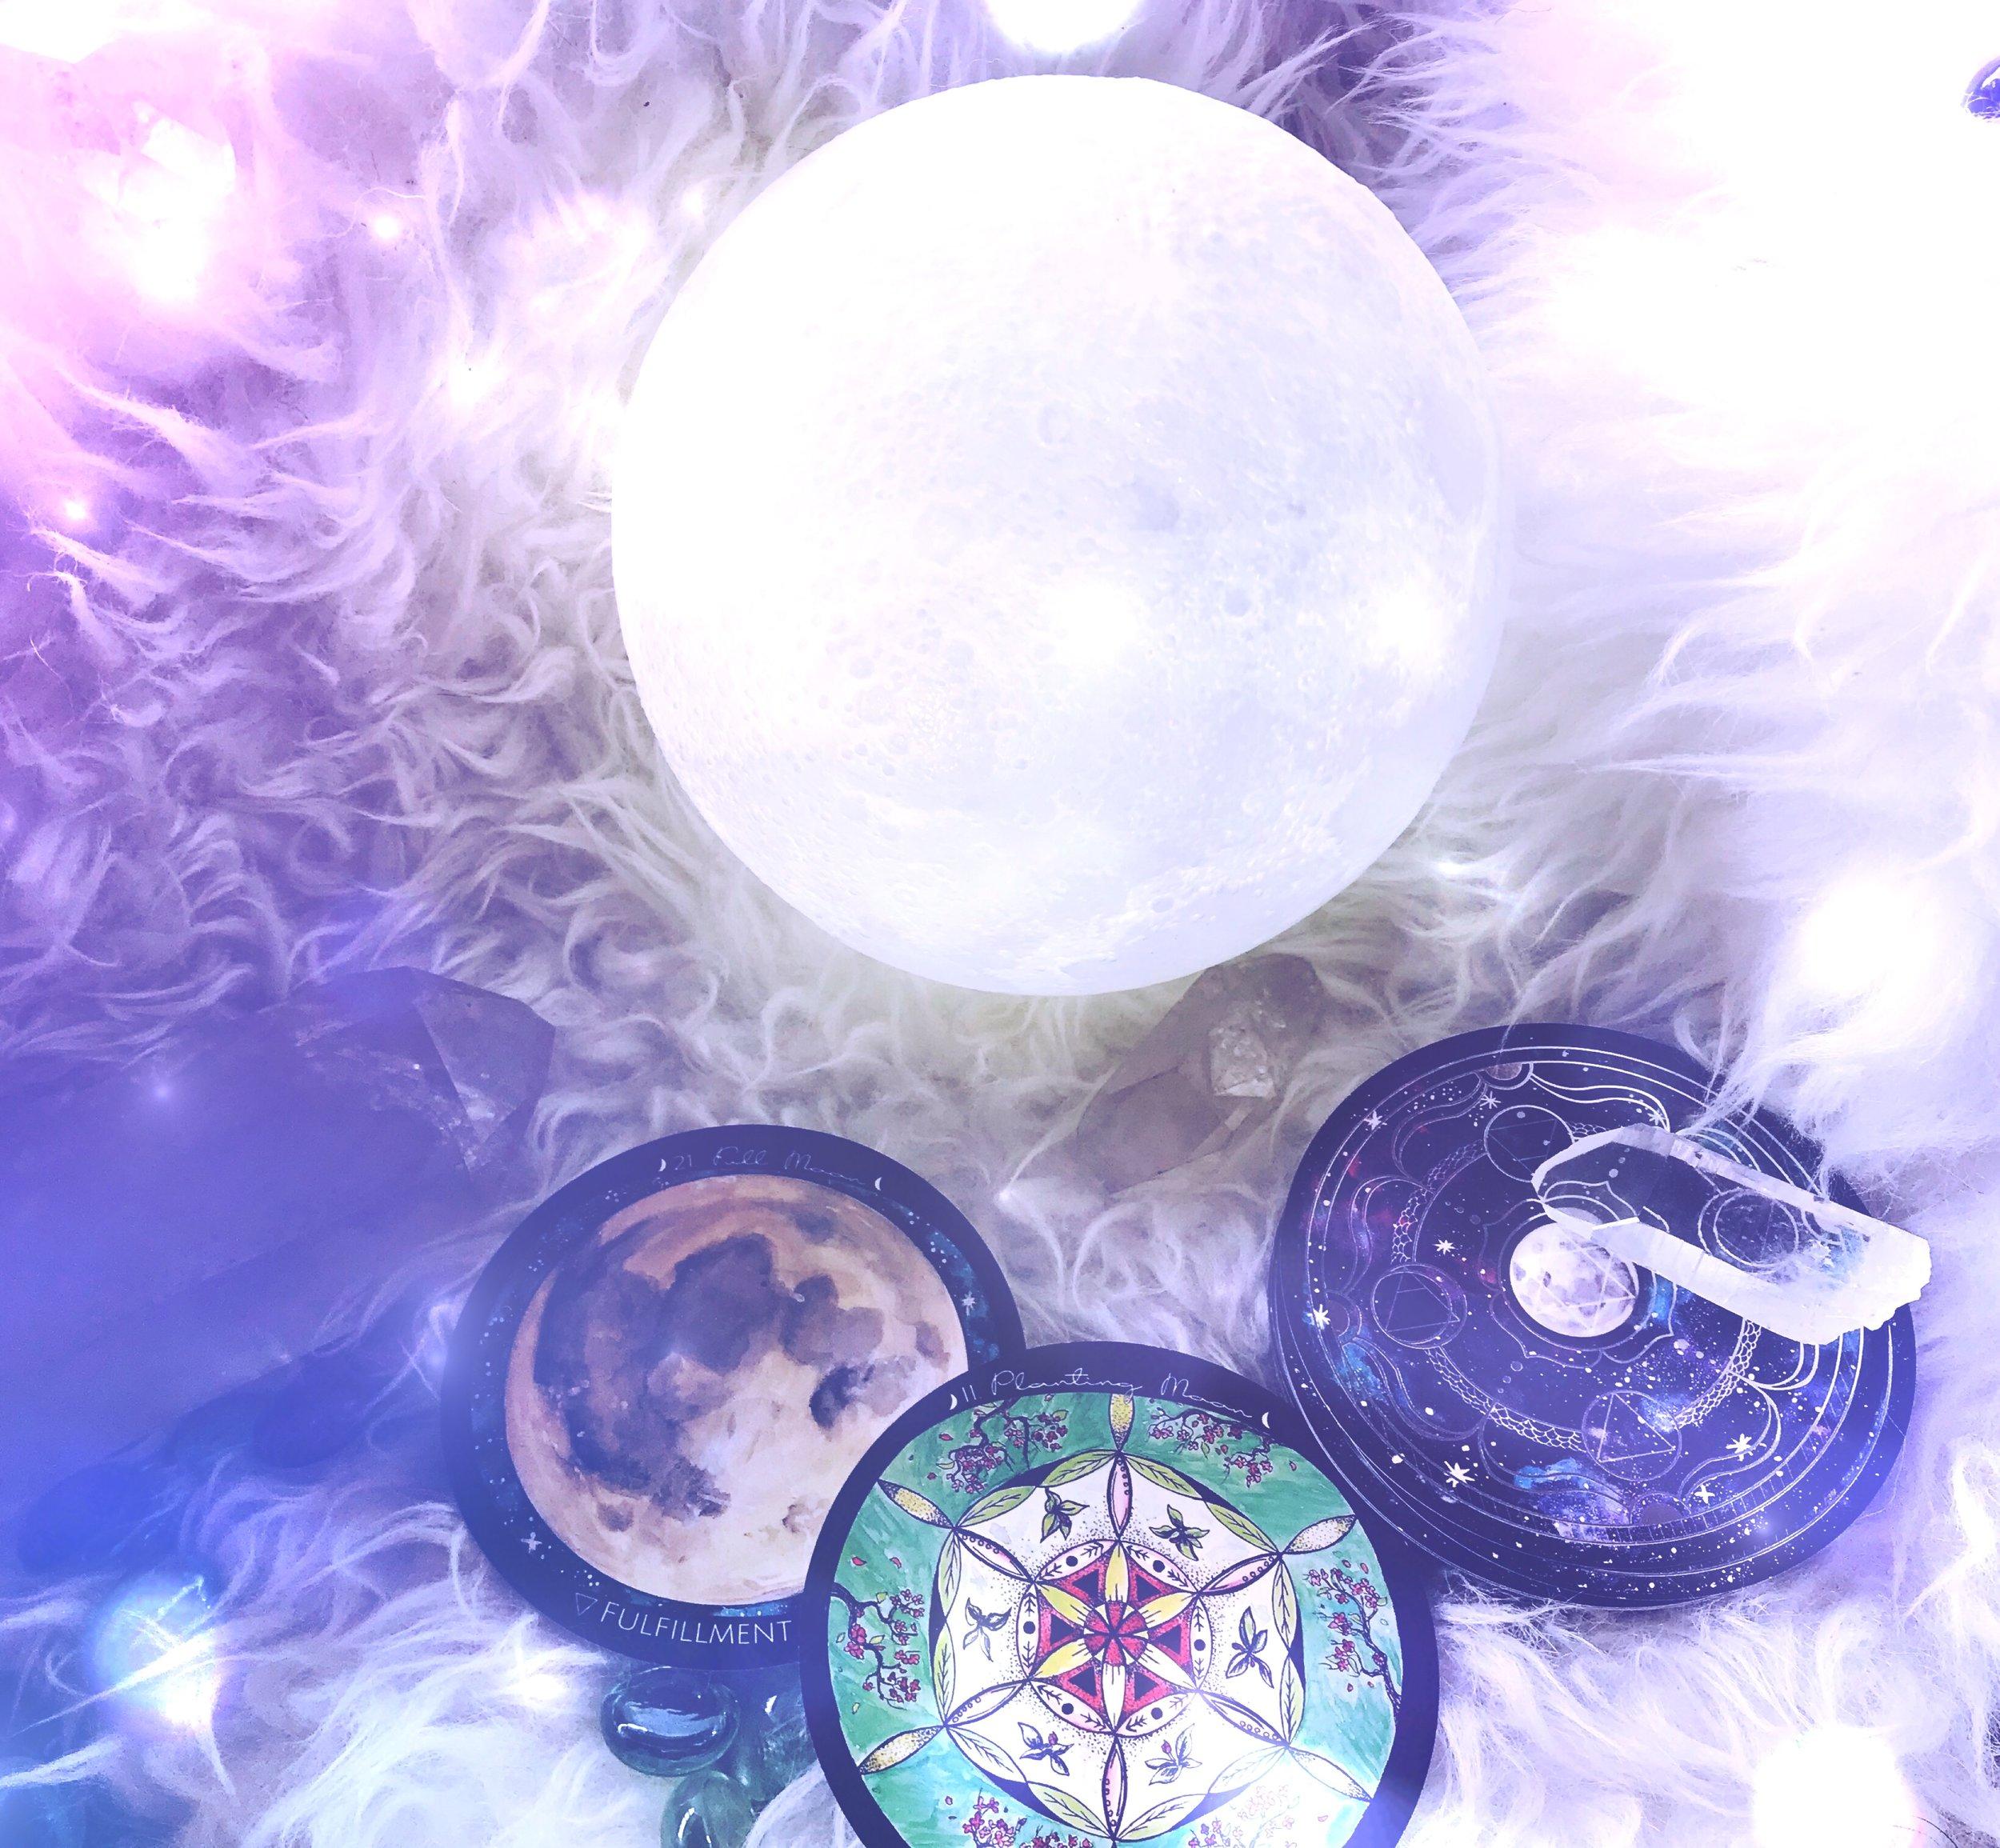 Planting Moon Energy Report - 2018 - Spirit de la lune